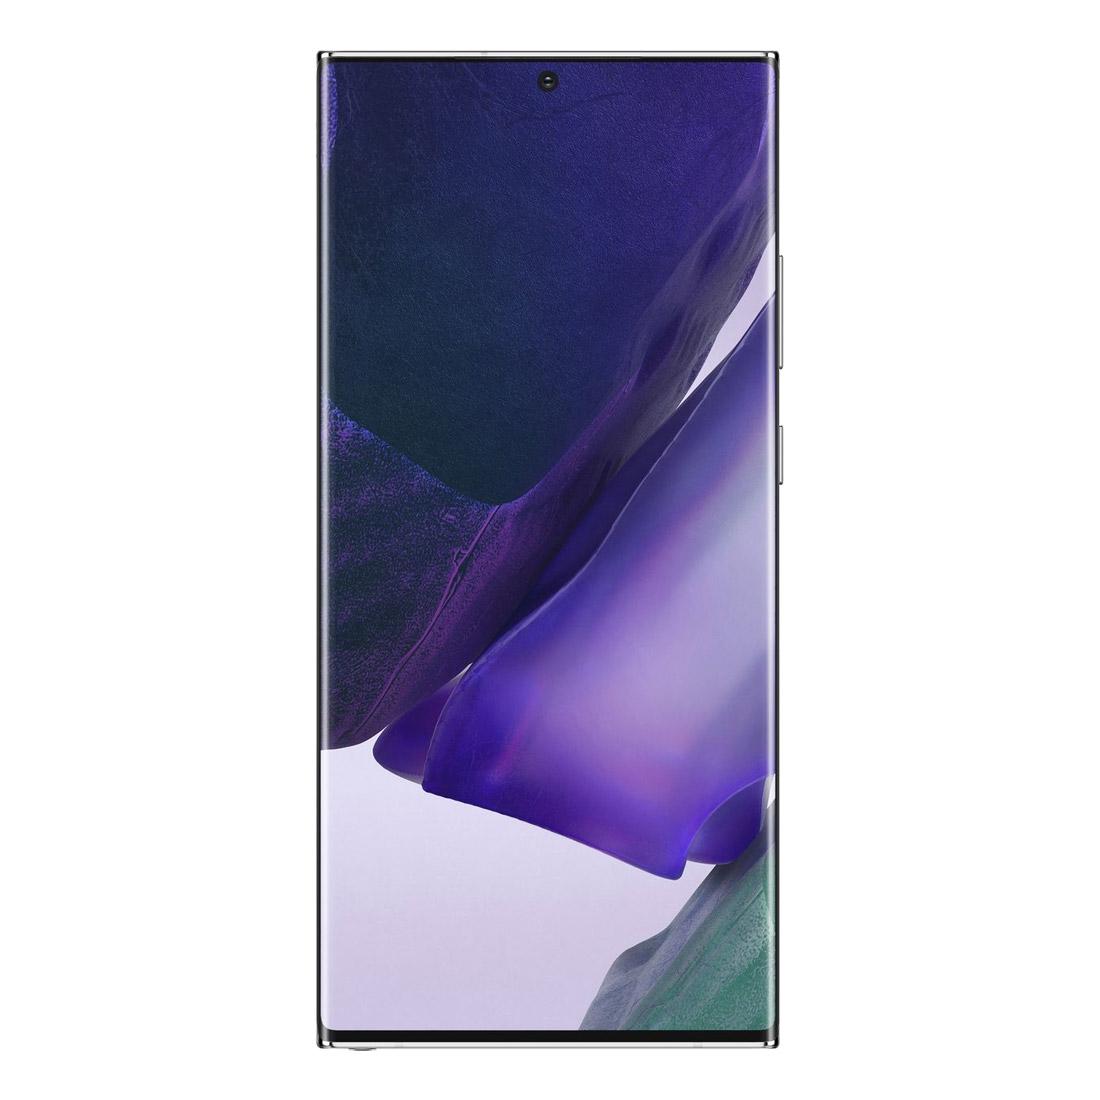 "Samsung Galaxy Note 20 Ultra 5G (6.9"" 120Hz, 108MP, 256GB/12GB) - White"